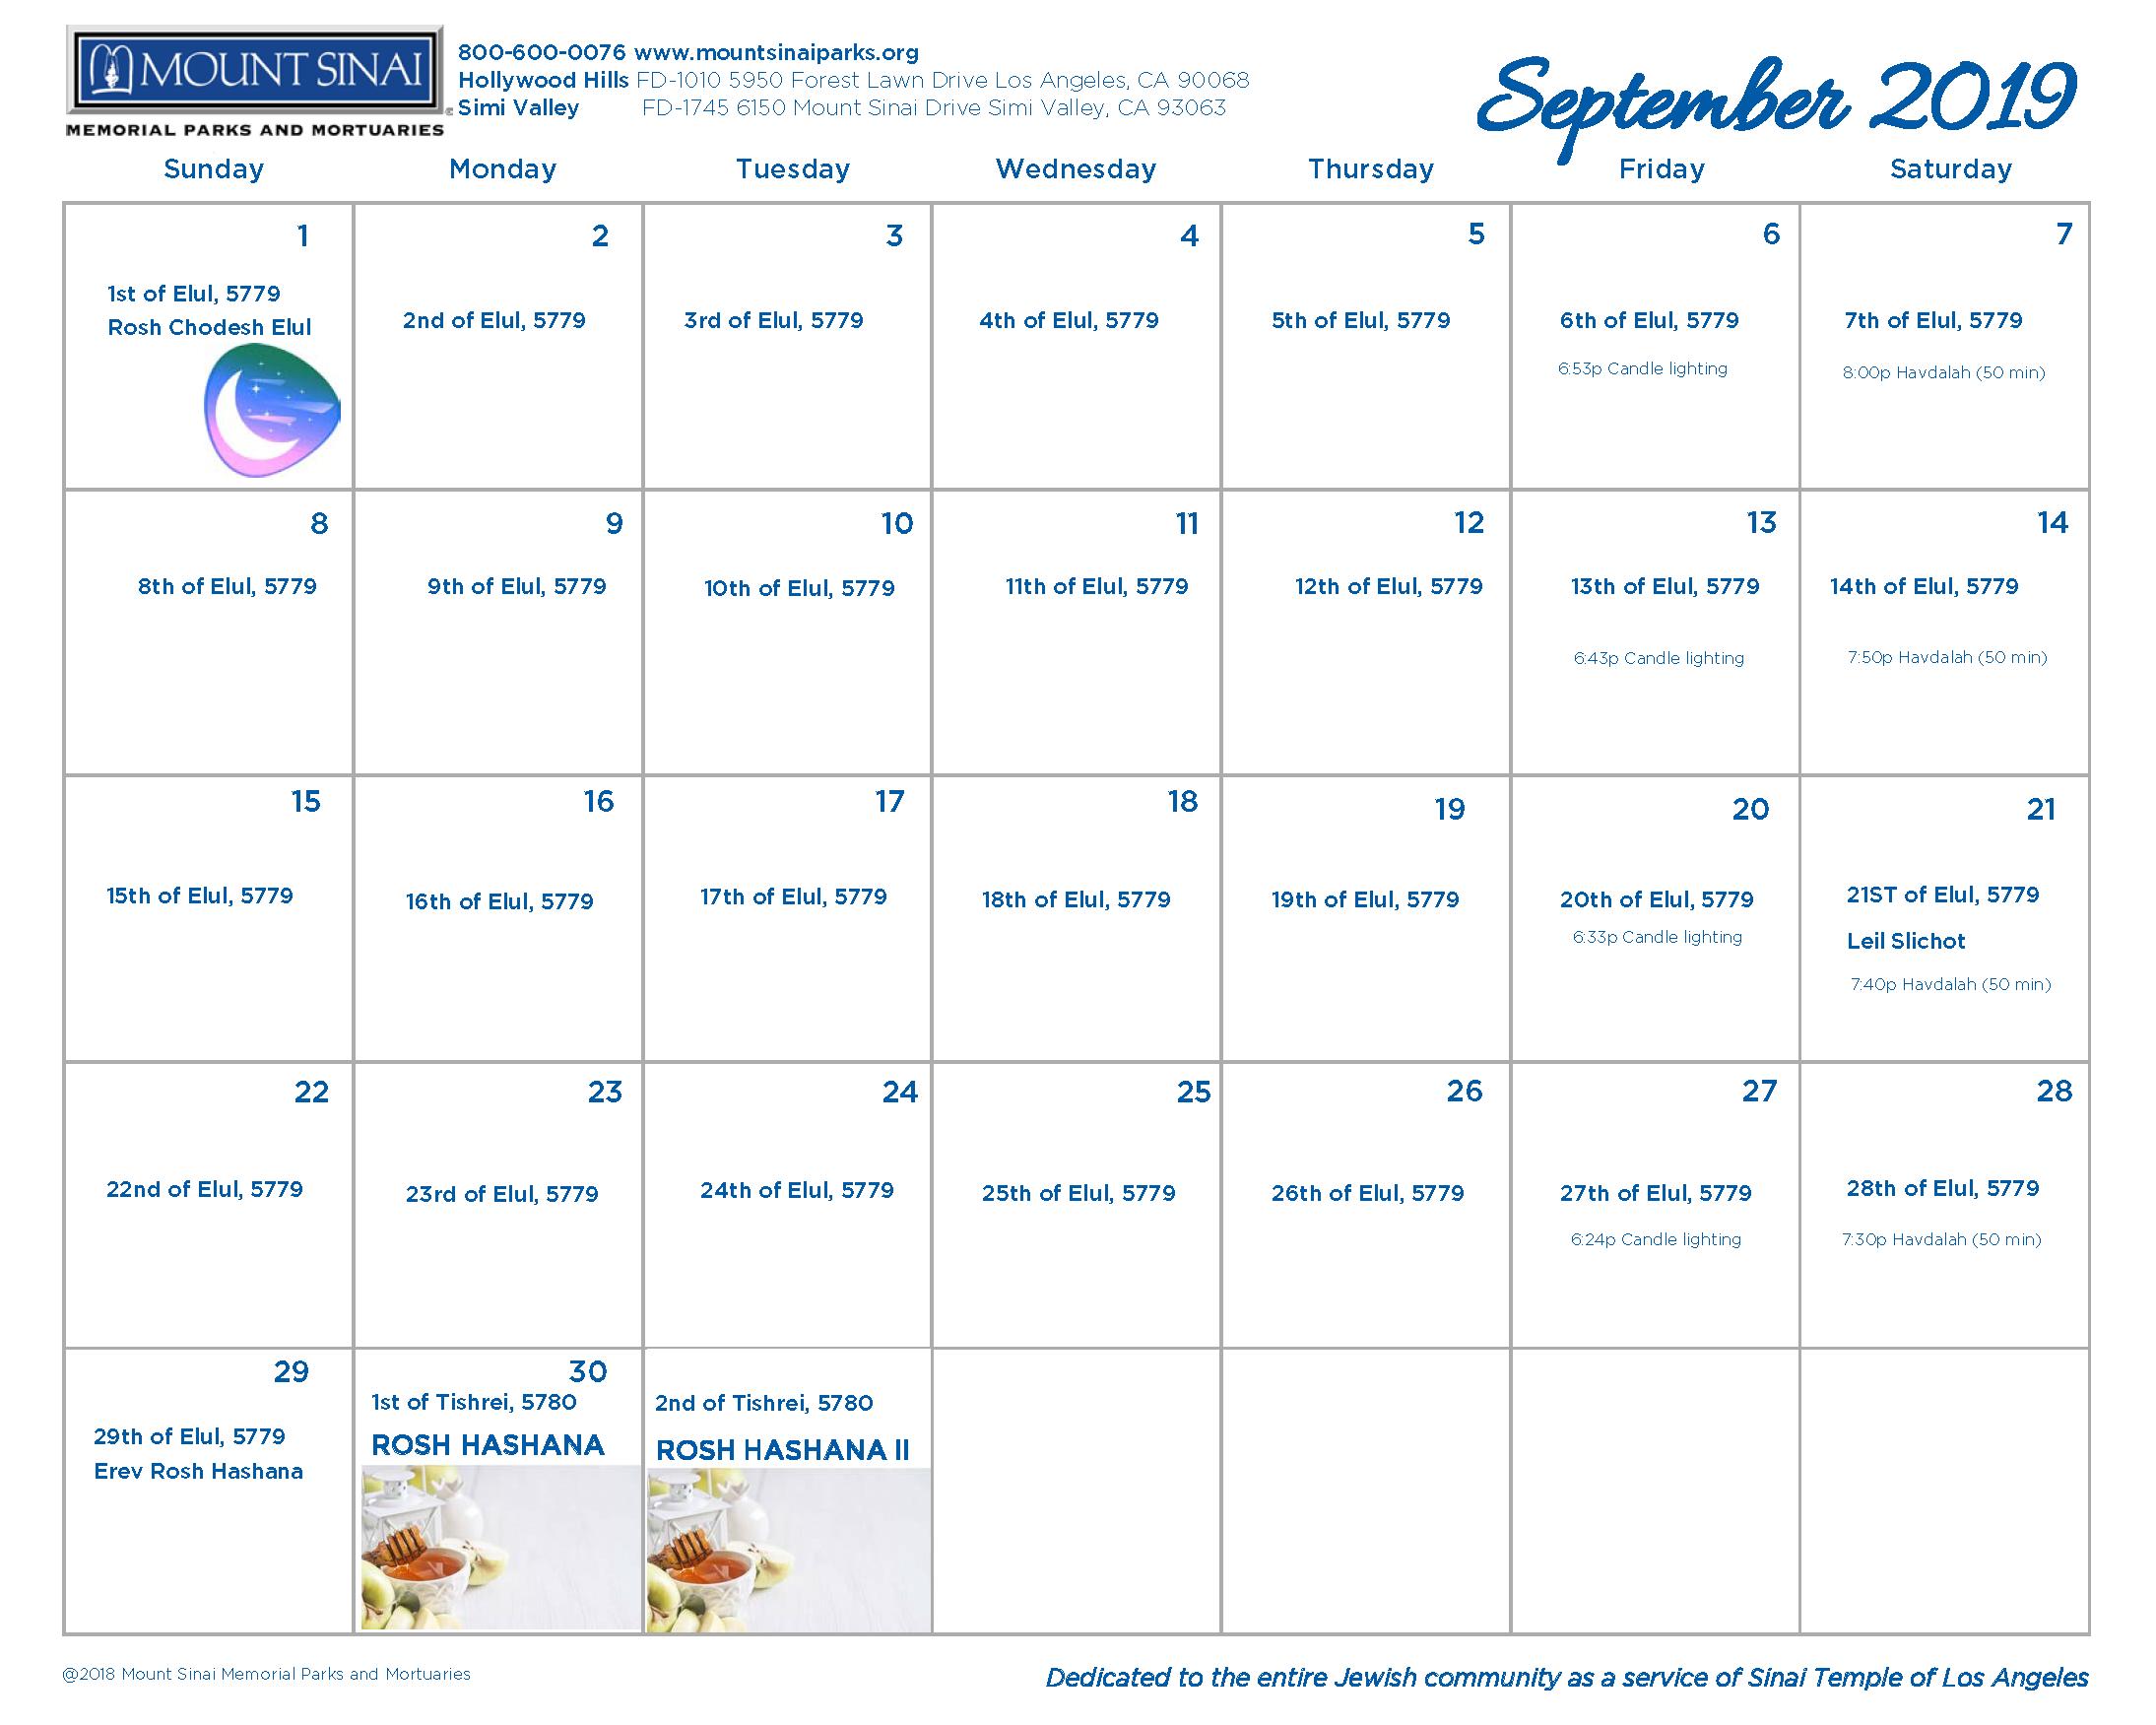 5779 Hebrew Calendar - Mount Sinai Memorial Parks And Mortuaries pertaining to Ewish Calendar 2019 - 2020